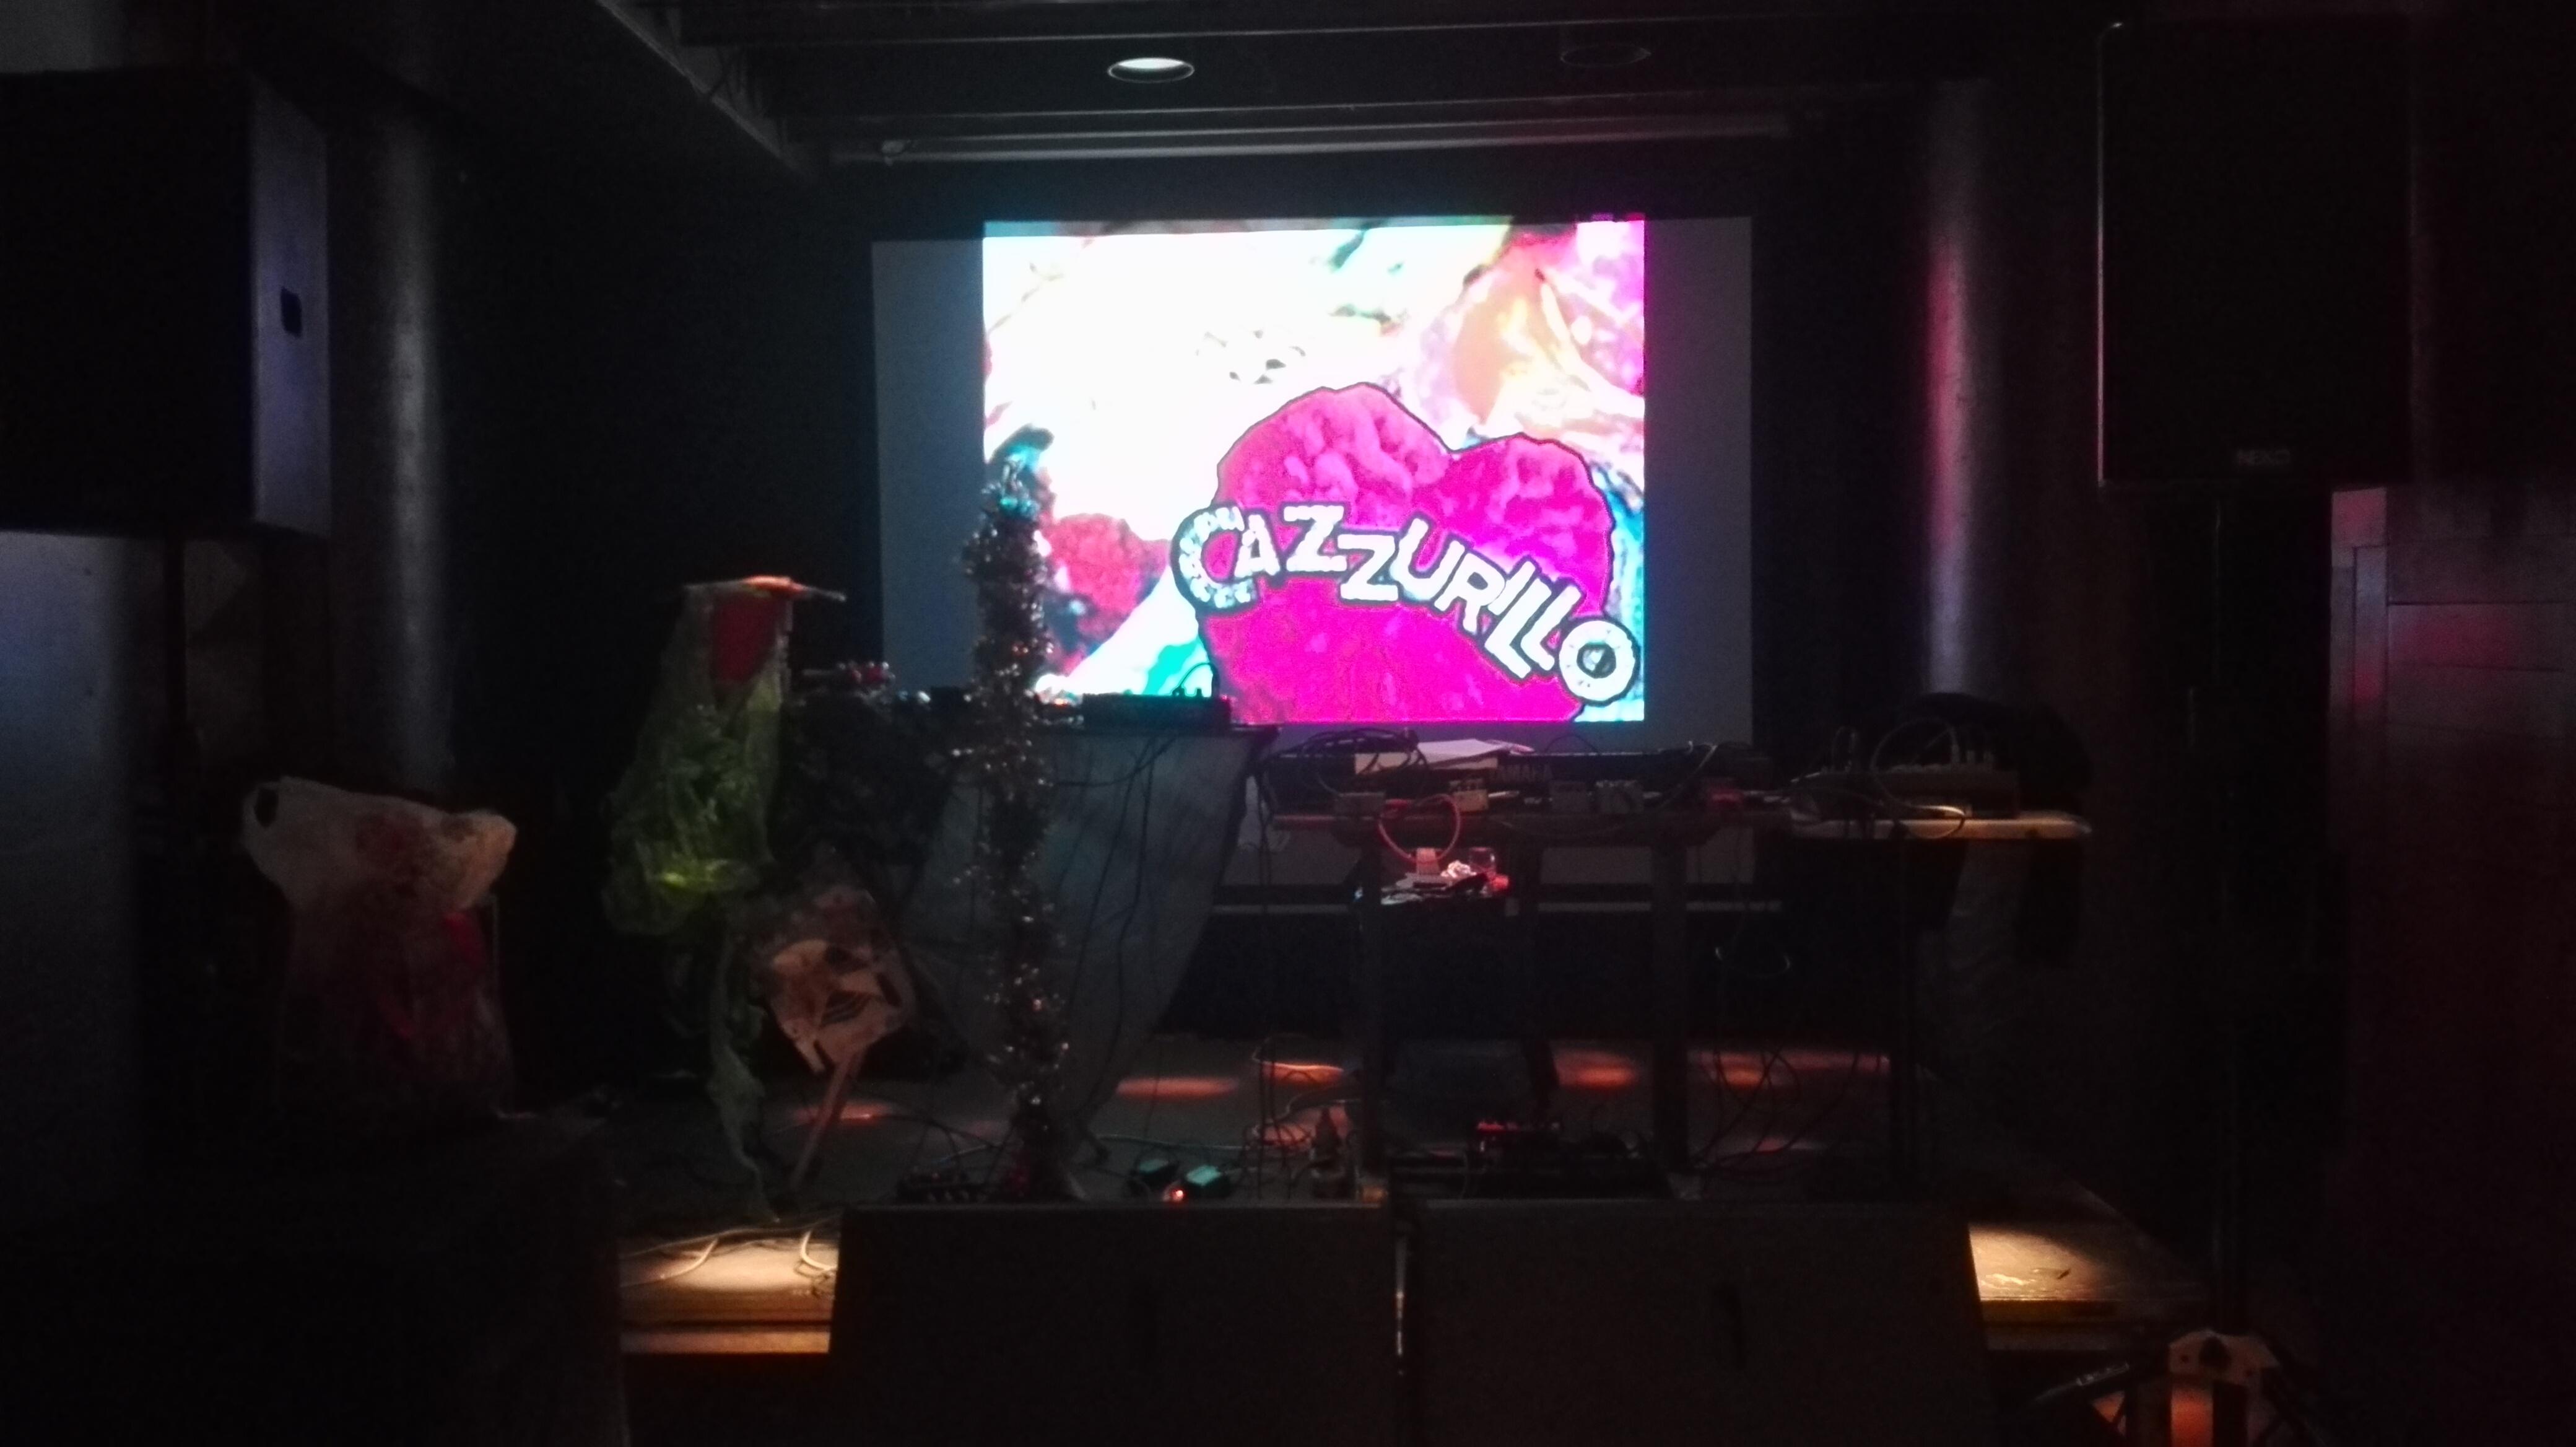 CAZZURILLO live @ Café Central Bruxelles 07-12-2017